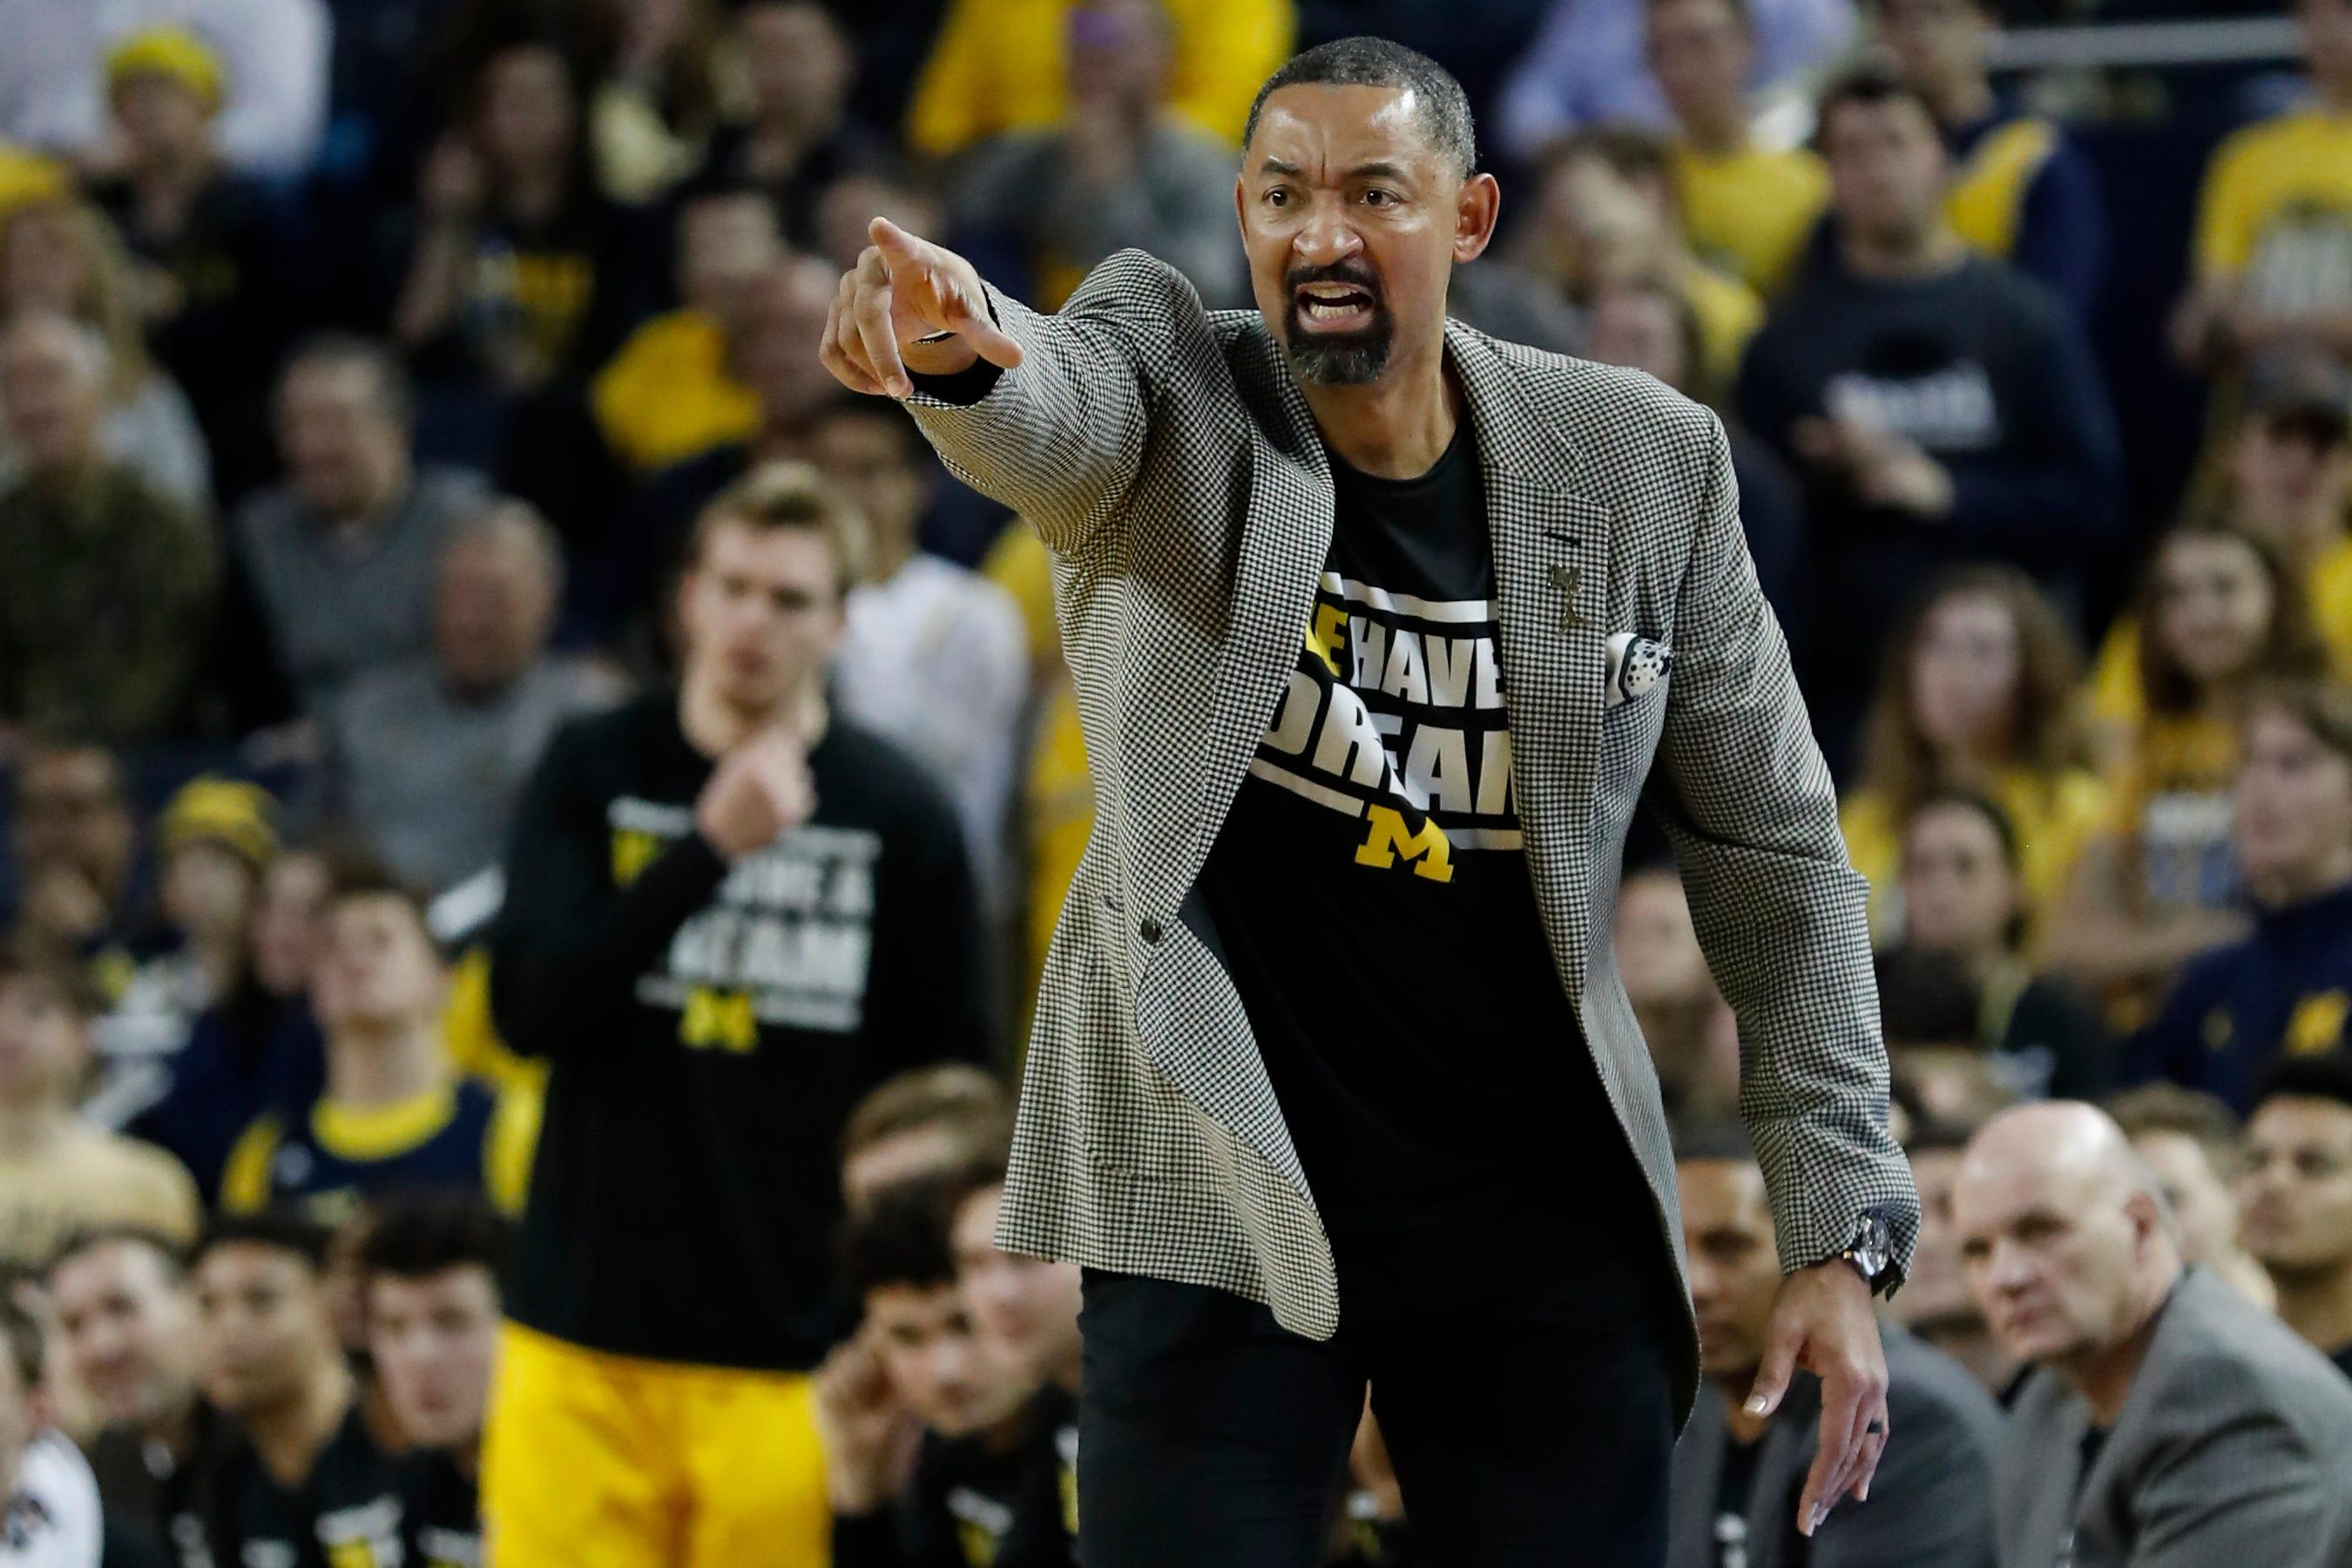 NBA teams interested in Michigan basketball coach Juwan Howard